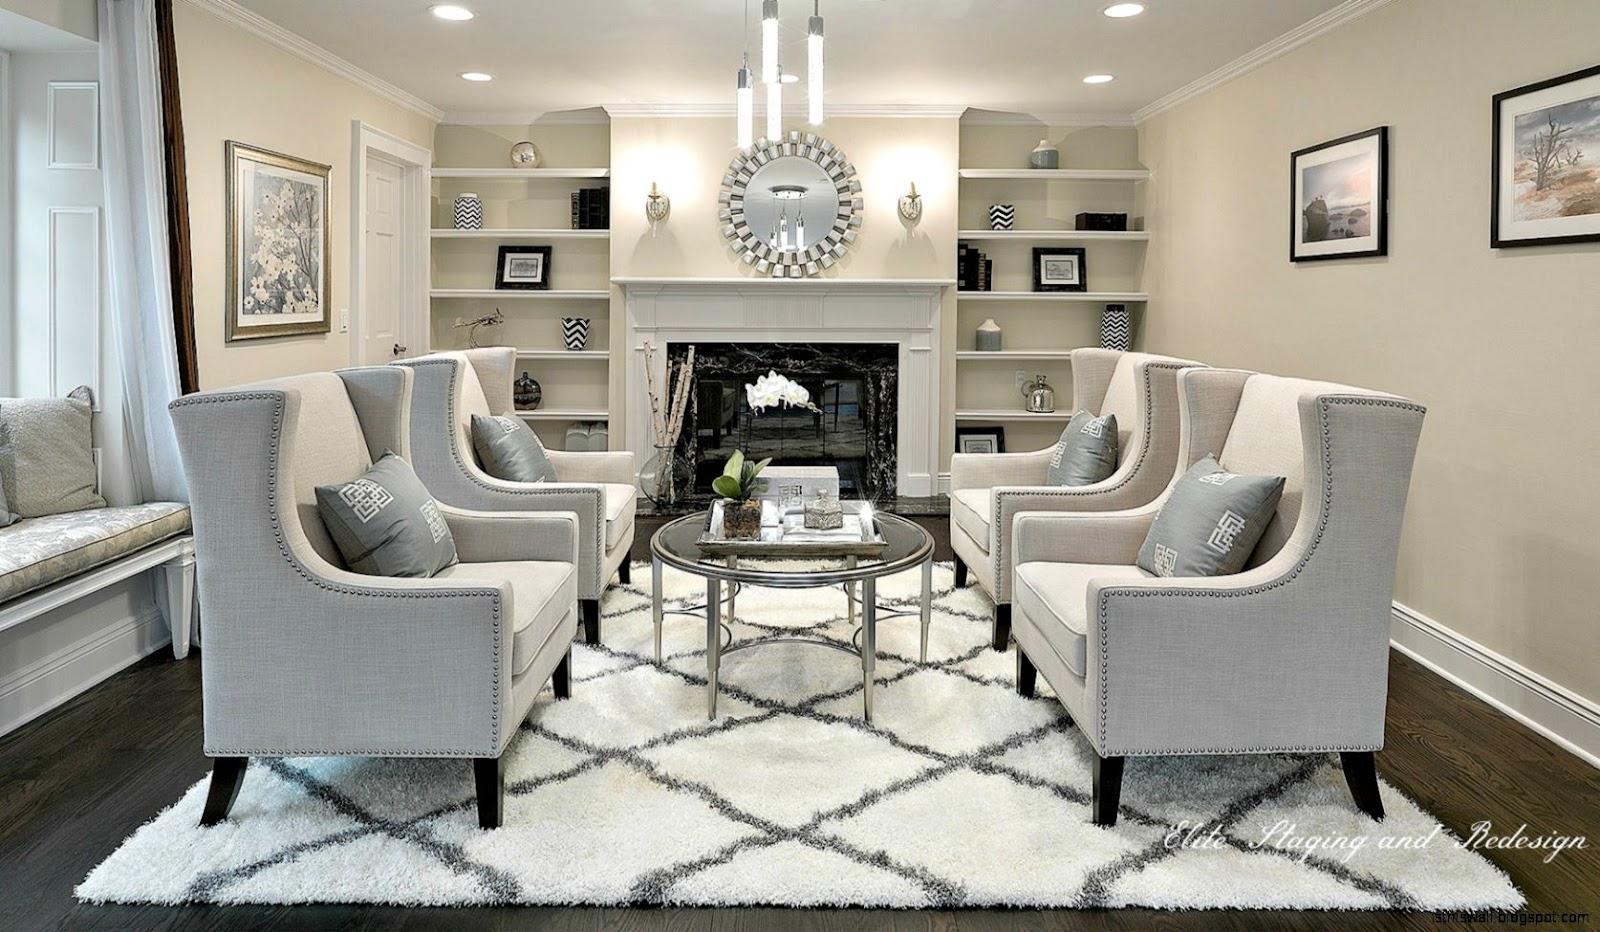 Home Staging Design Home Design Ideas Home Staging Design Signupmoney